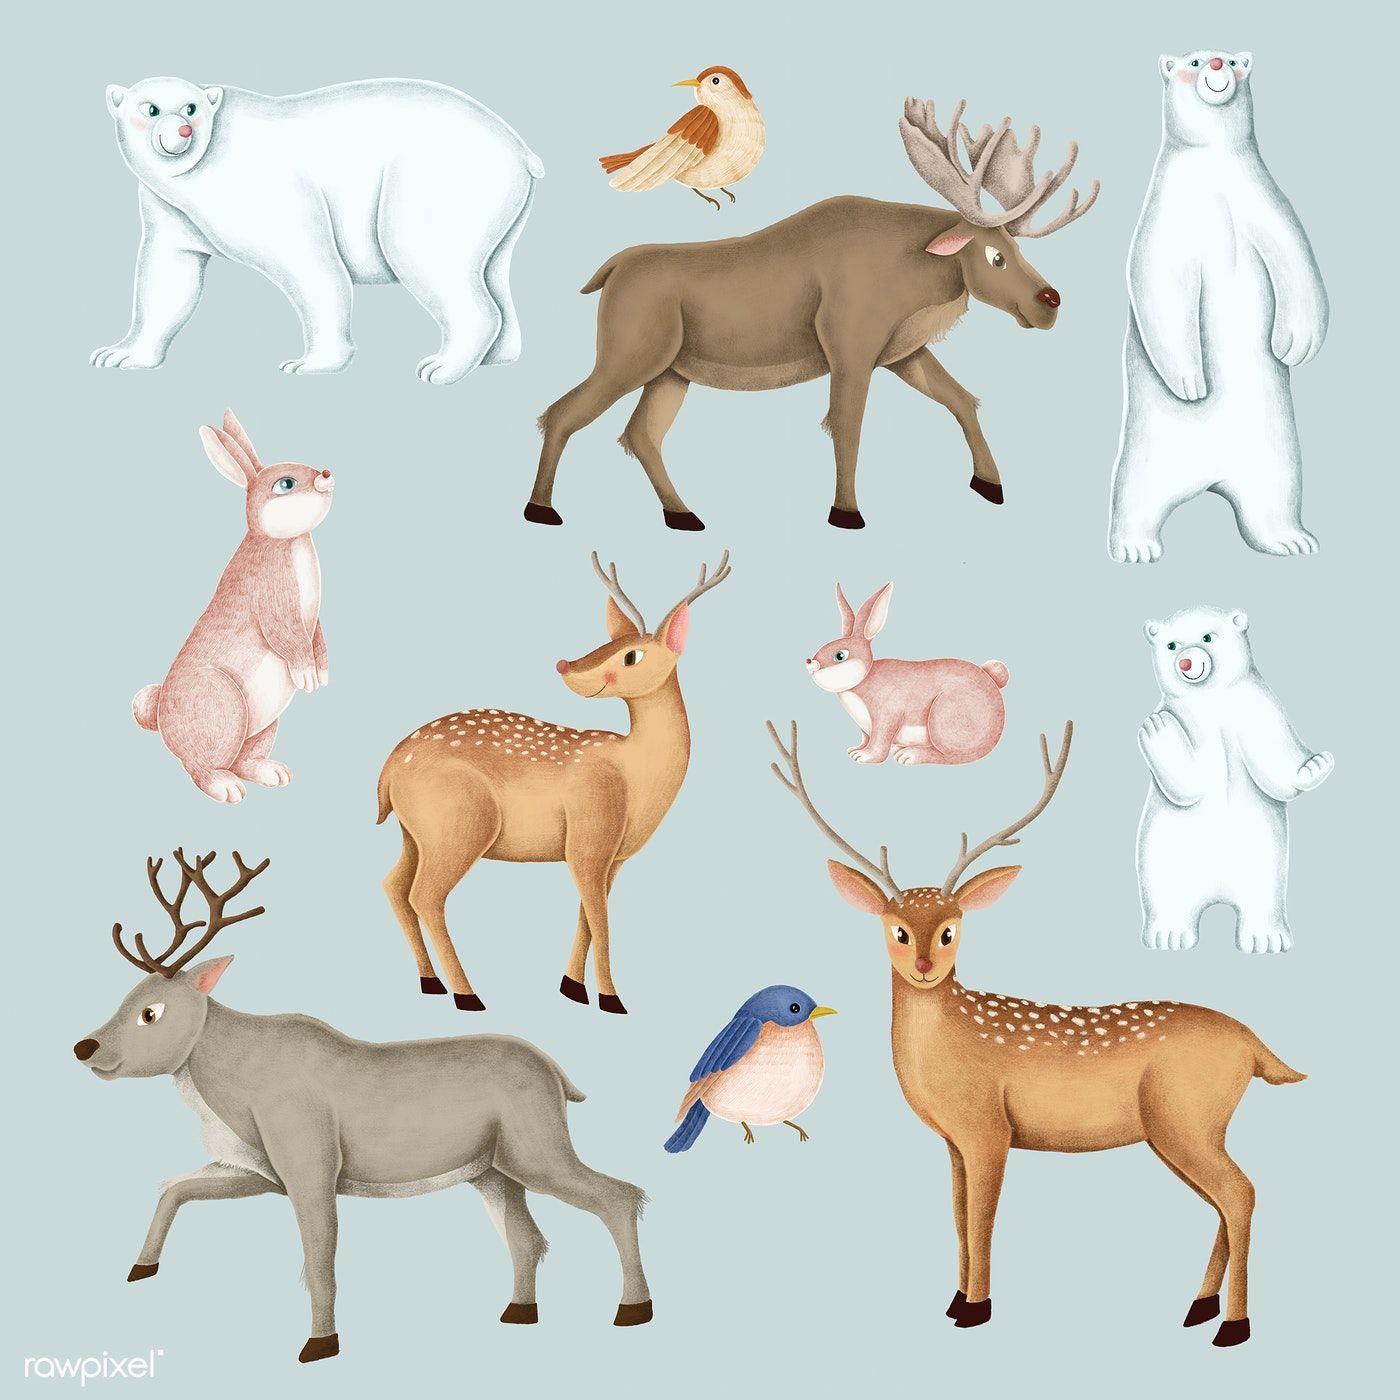 Download premium illustration of Handdrawn wild animal